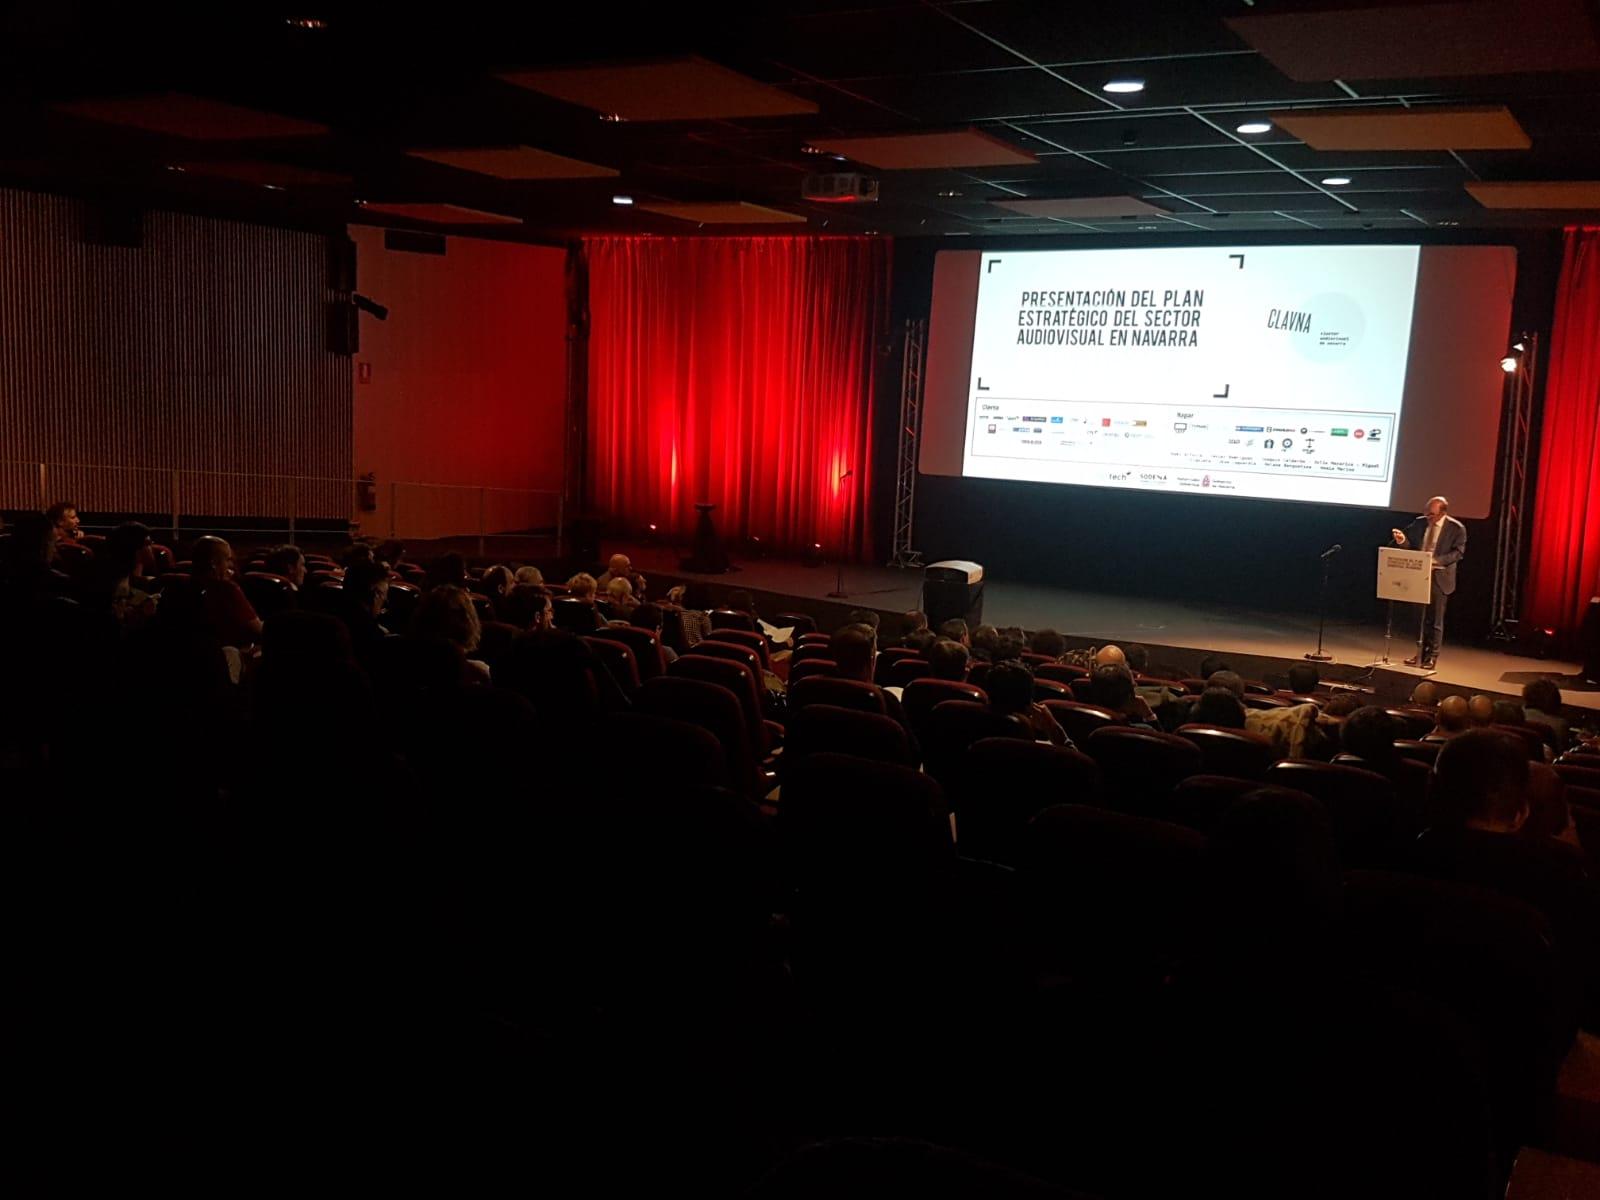 Momento de la presentación del Plan Estratégico de la Industria Audiovisual de Navarra en la Filmoteca. (FOTO: Eduardo Sanz)